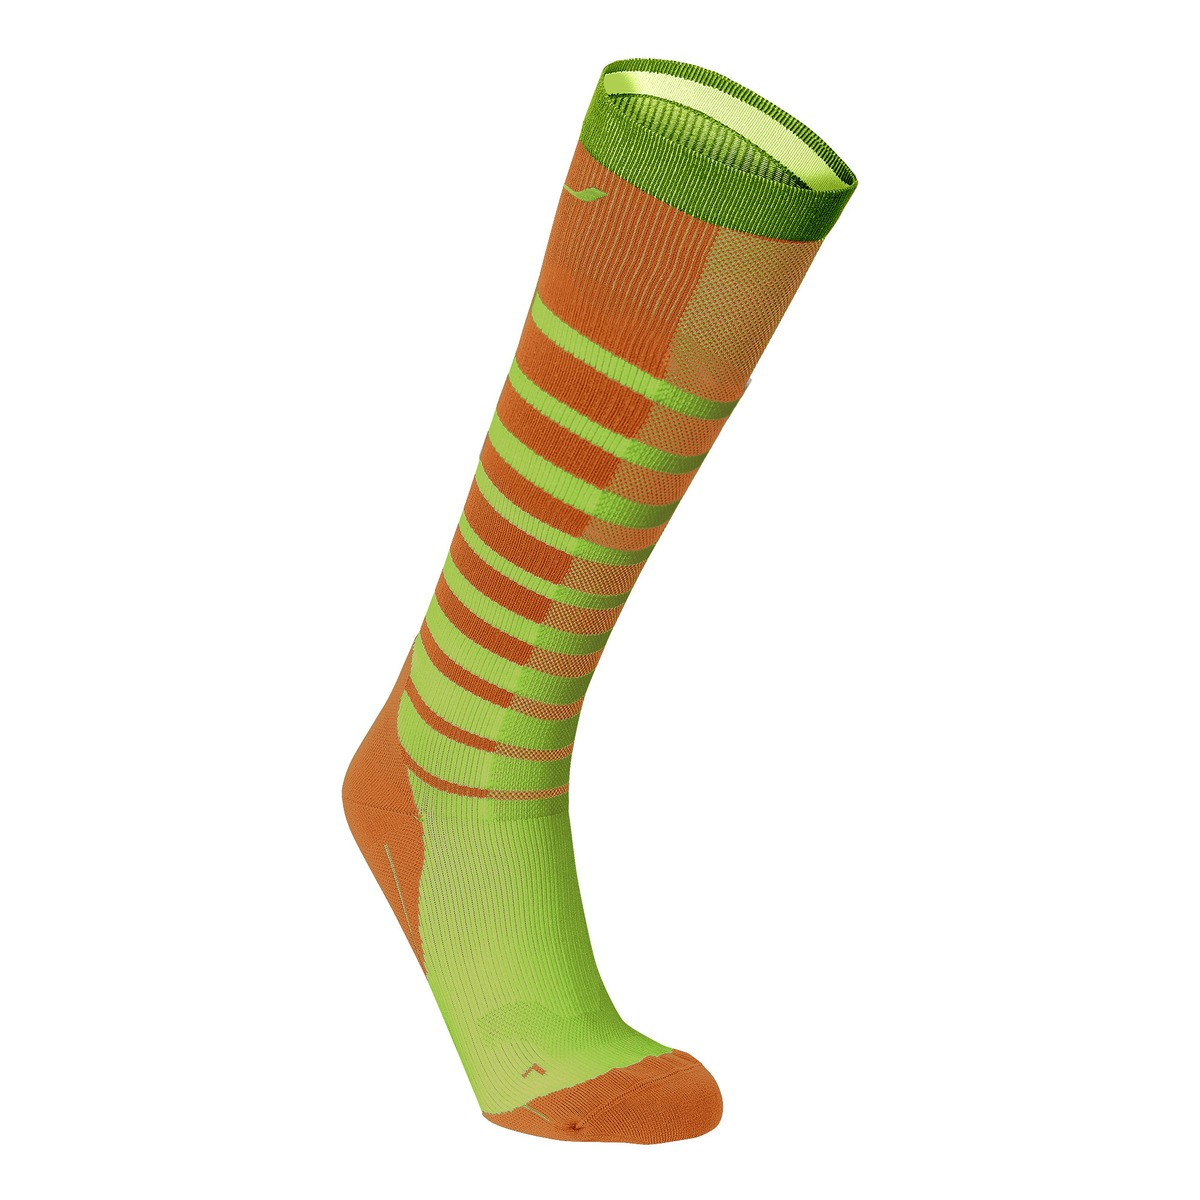 20312aa9def gul 2xu striped run compression socks mns sunburst orange brig  funktionsstrumpor